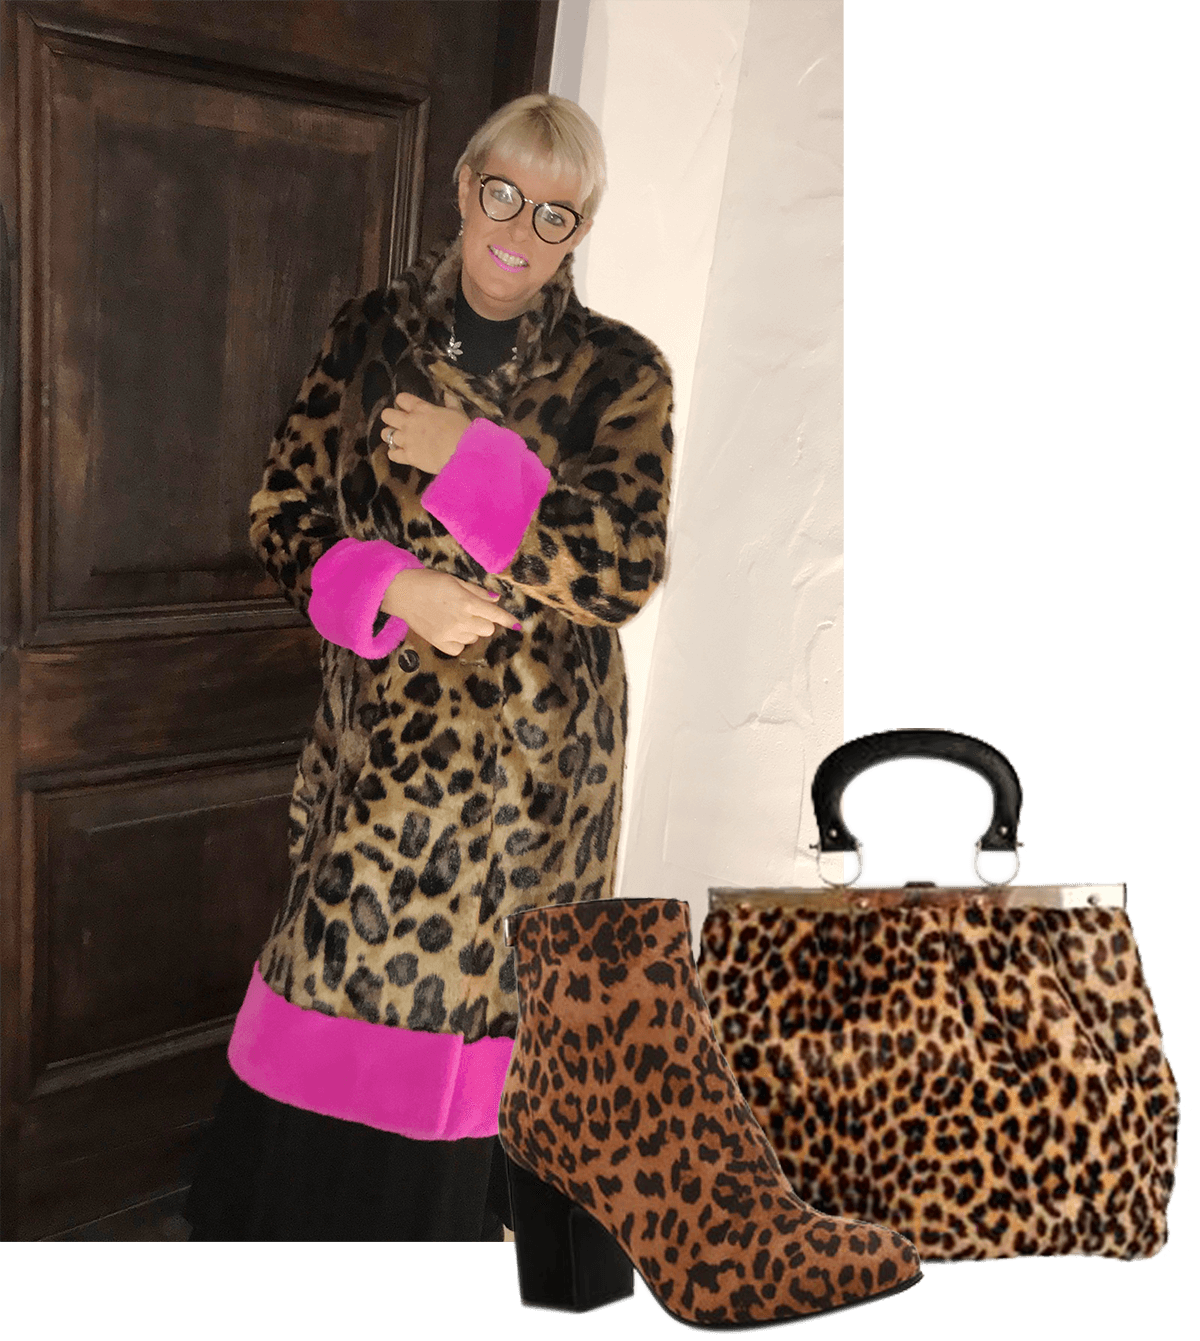 Vicki wears Trelise Cooper